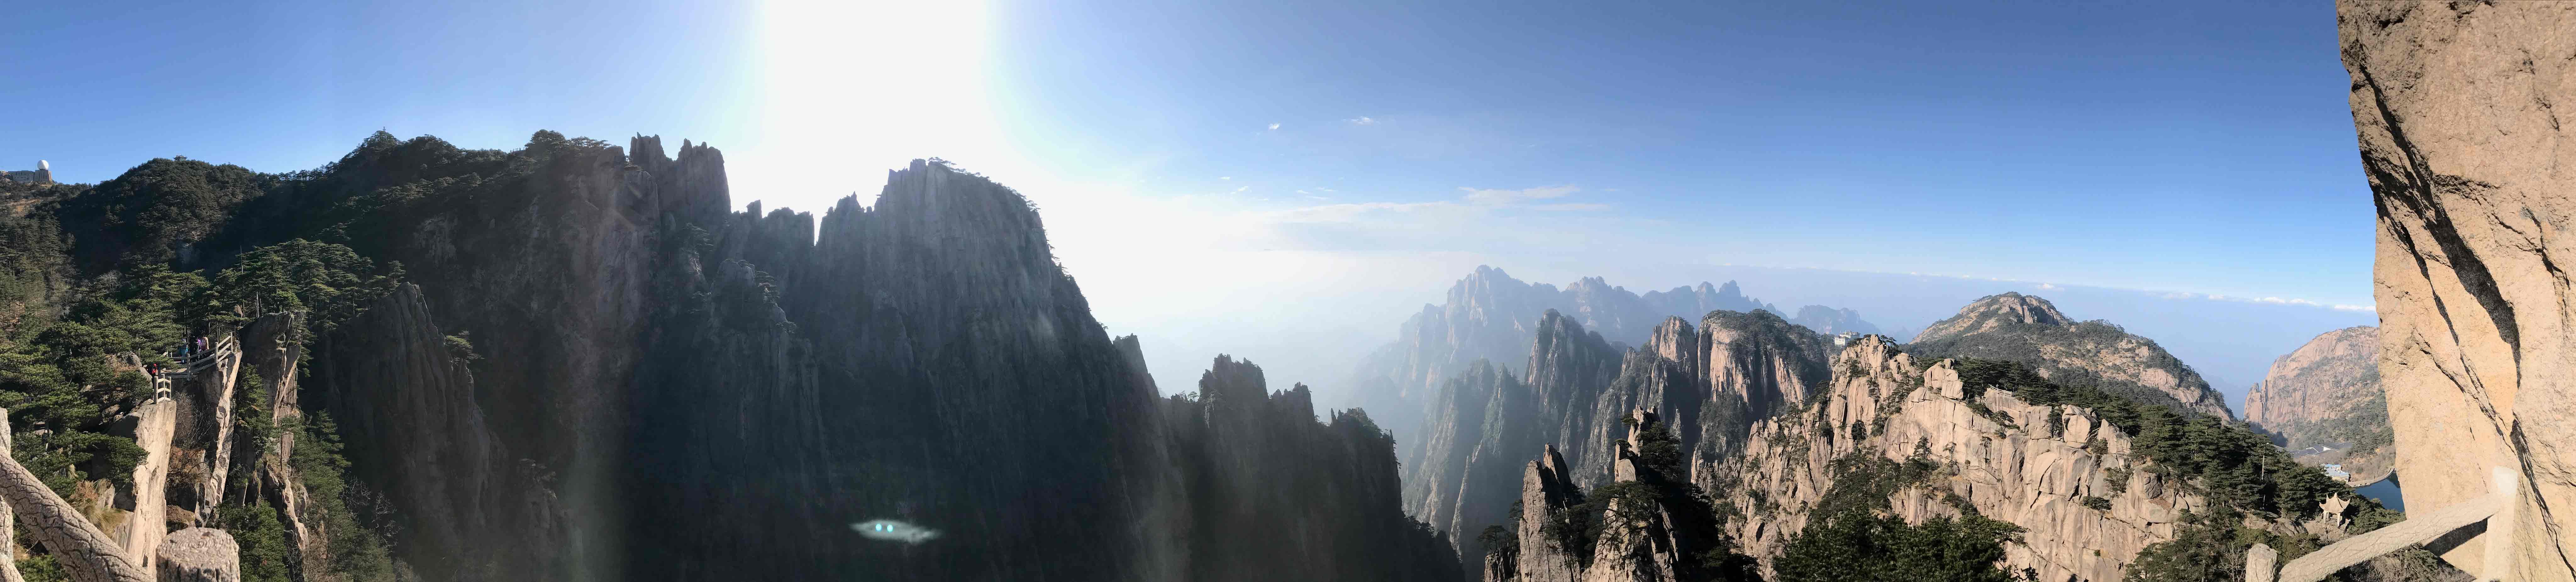 Huang-Shan-Panorama-02